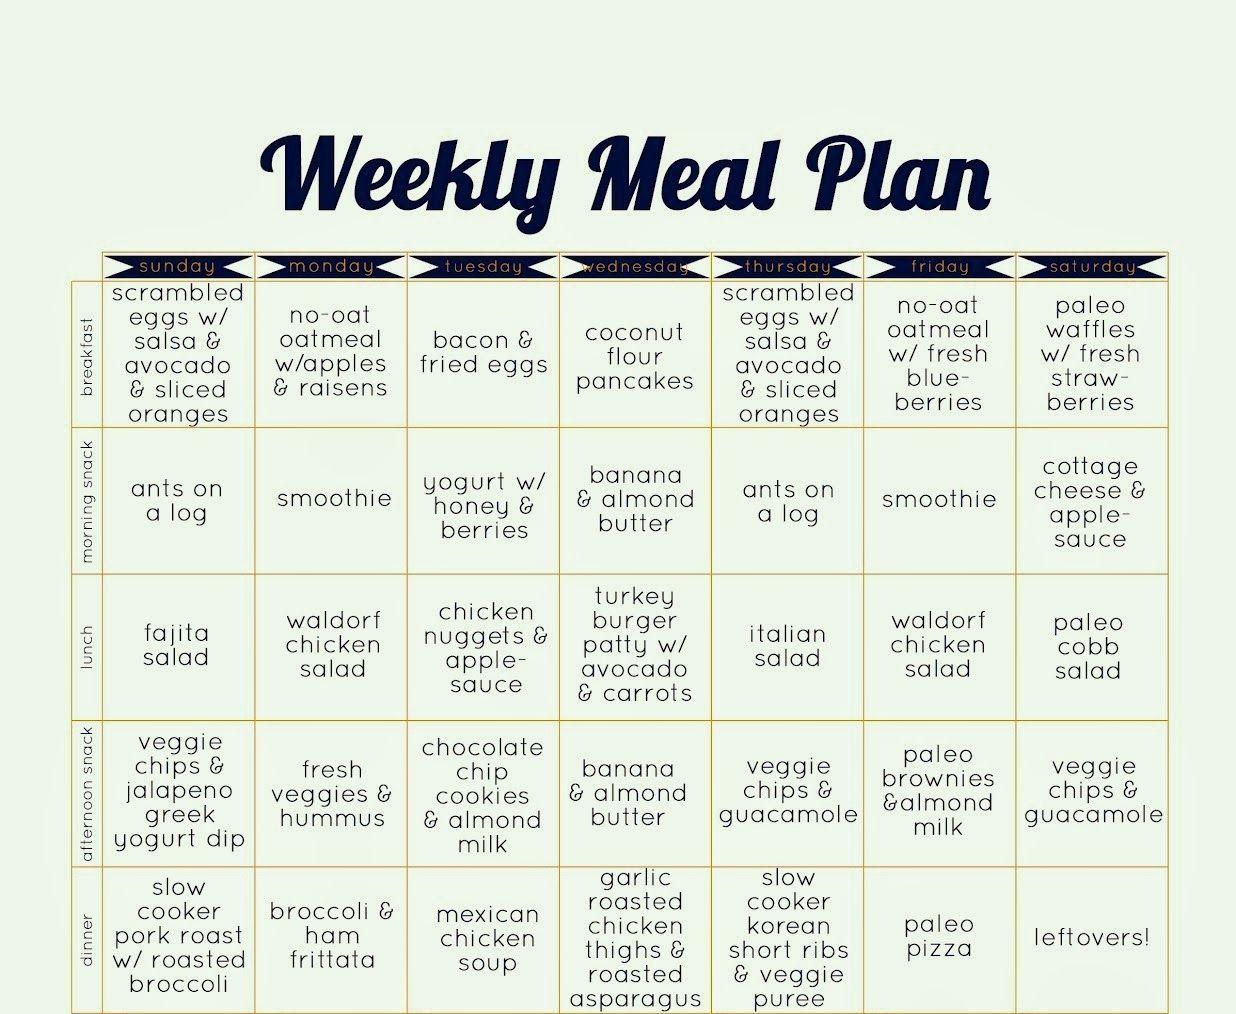 Paleot Meal Plan